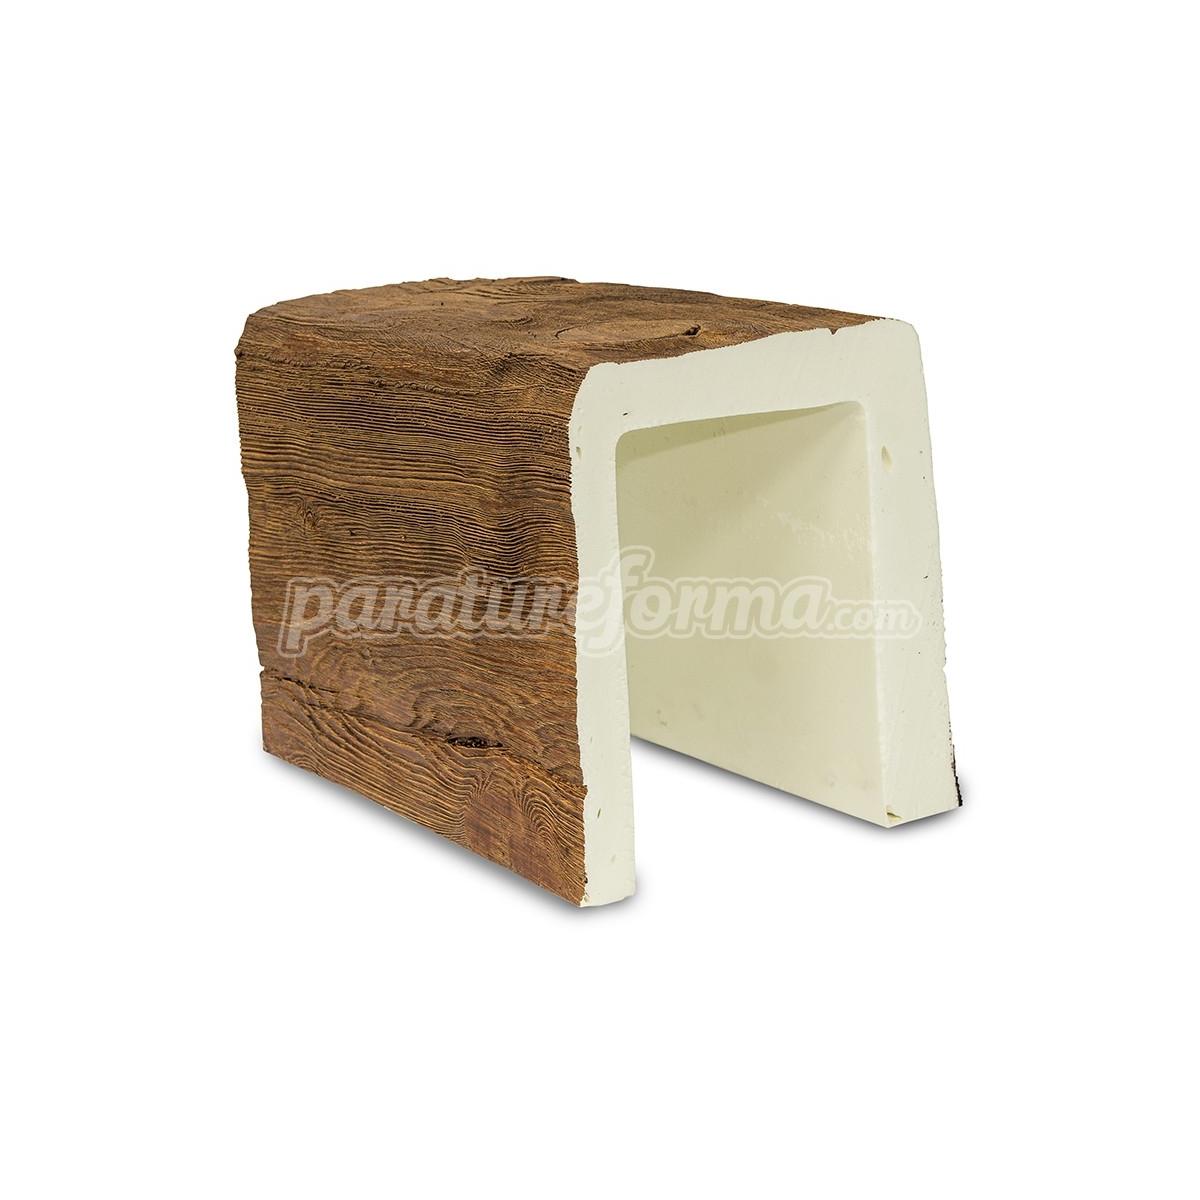 Viga imitación a madera 300x23x18 - Vigas imitación madera cuadradas